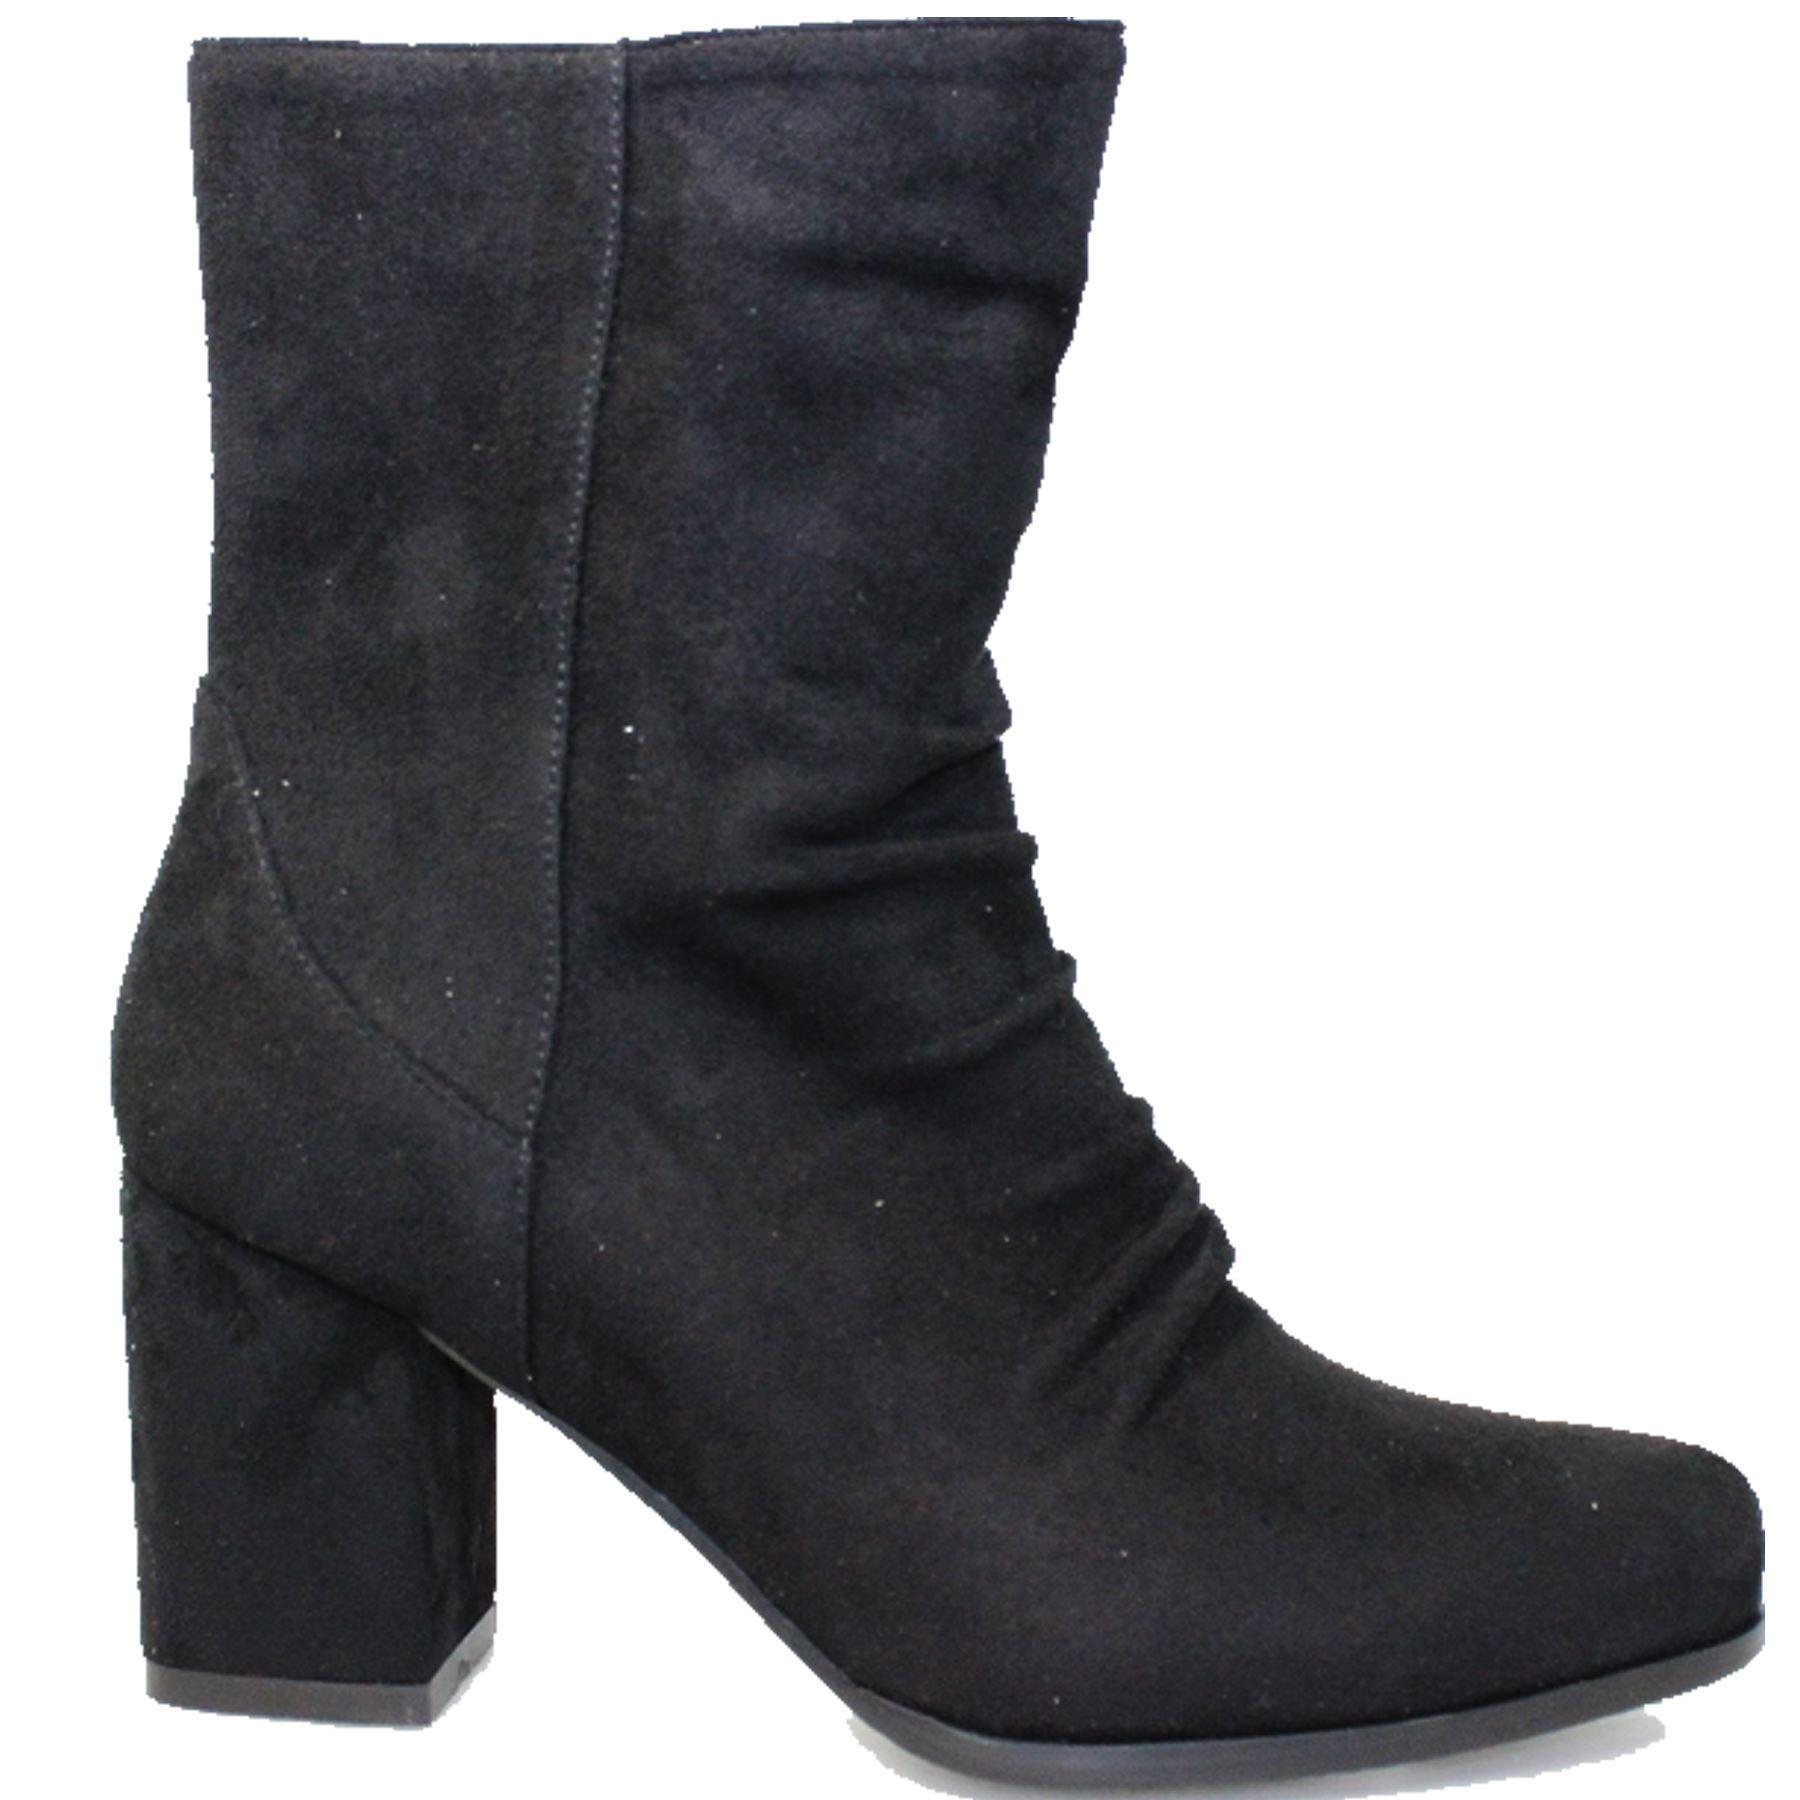 GLC673 Karla  Faux Suede  Karla Zipper Lined Padded Insole Block Heel Ankle Boots 1f3023